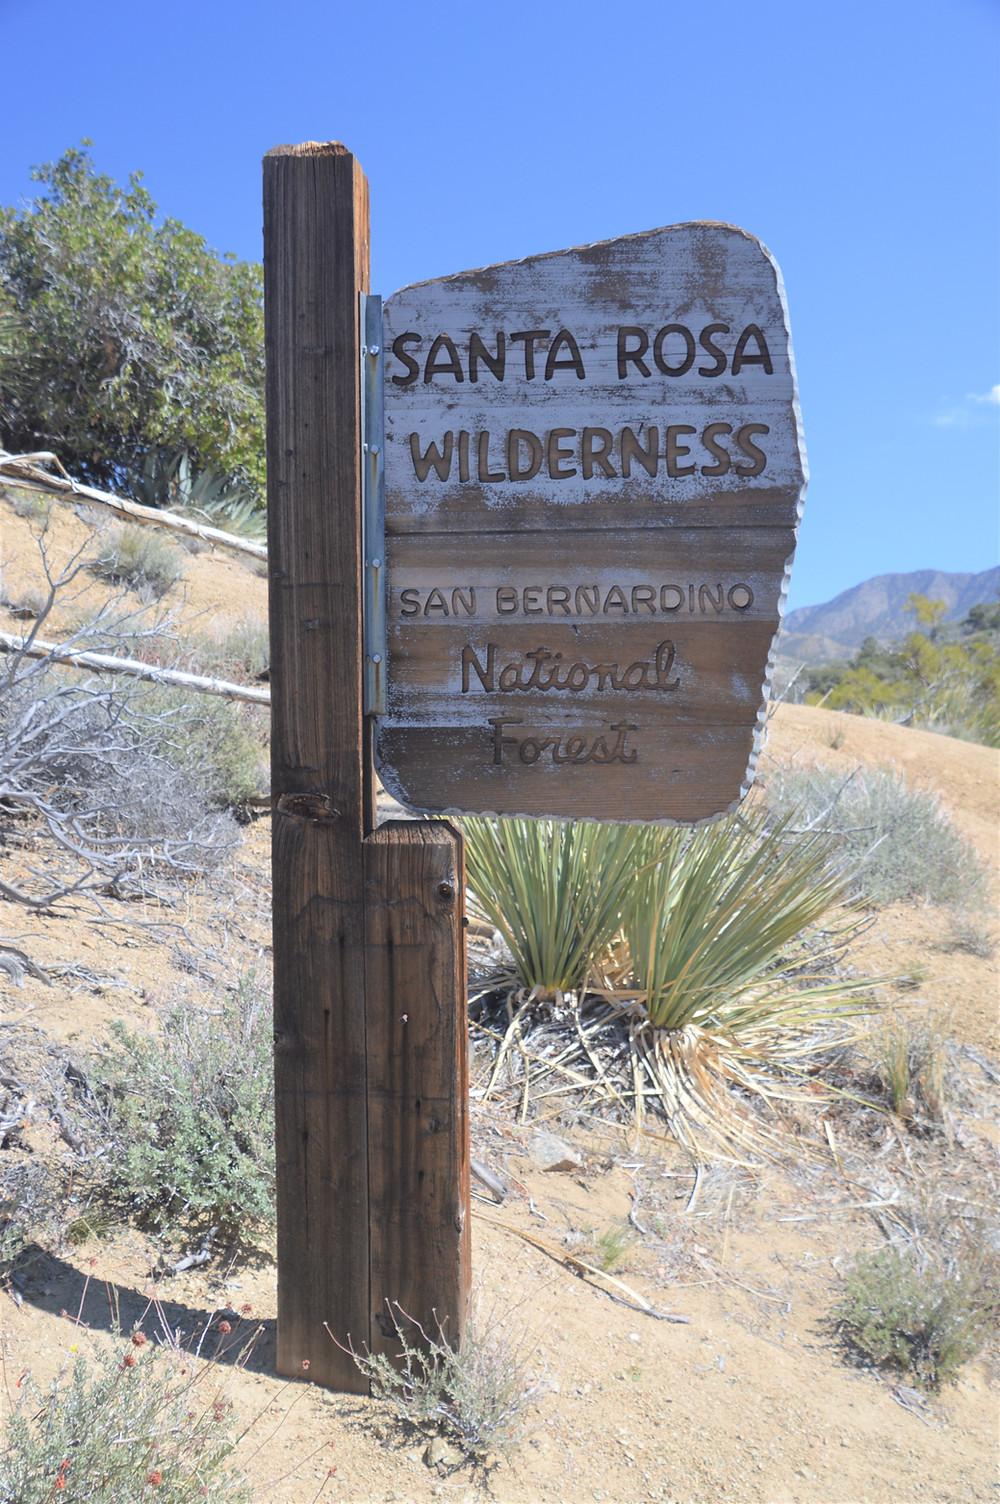 Entering Santa Rosa Wilderness along the Cactus Spring trail